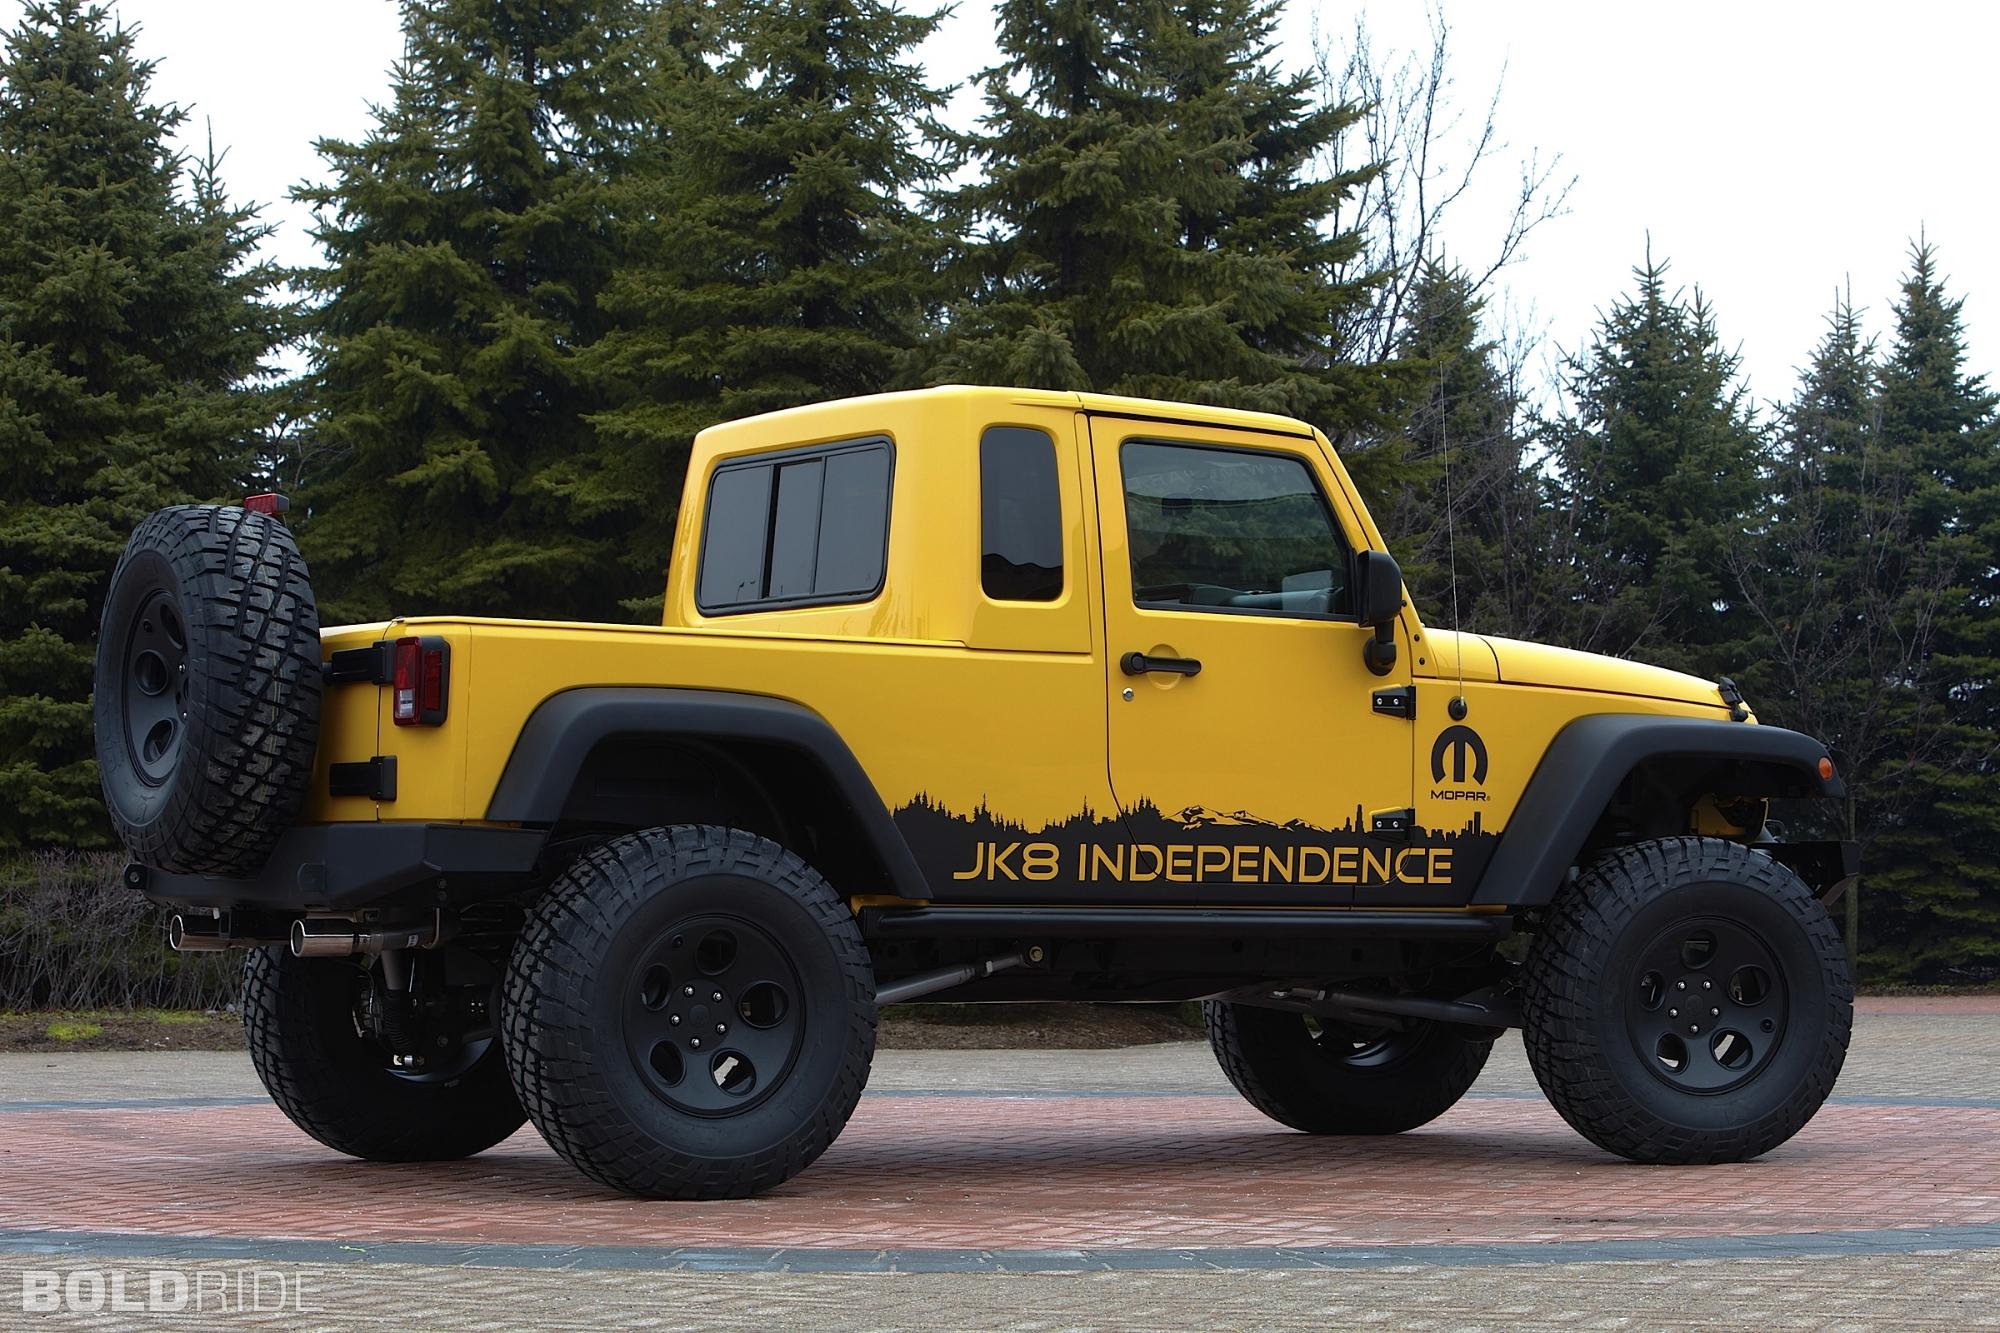 2000 jeep wrangler - image #5